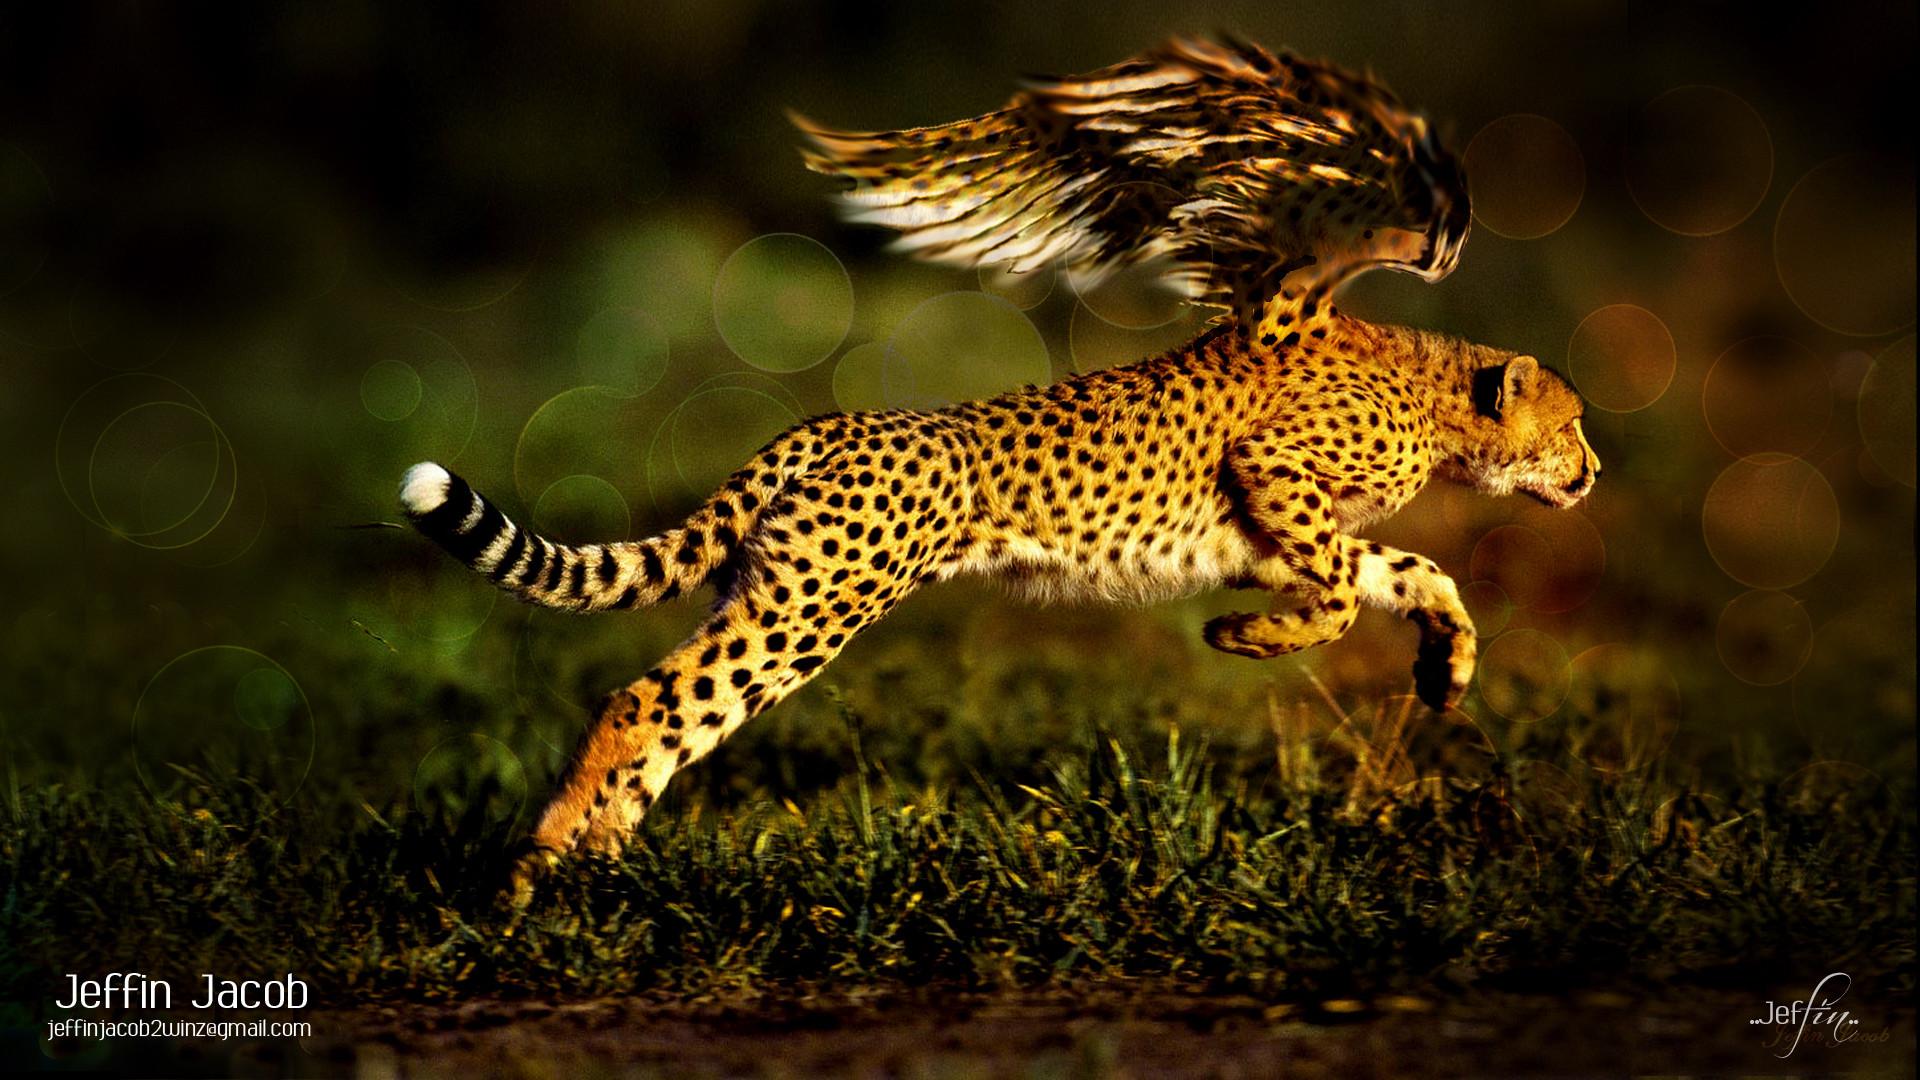 Res: 1920x1080, Cheetah Wallpaper 57